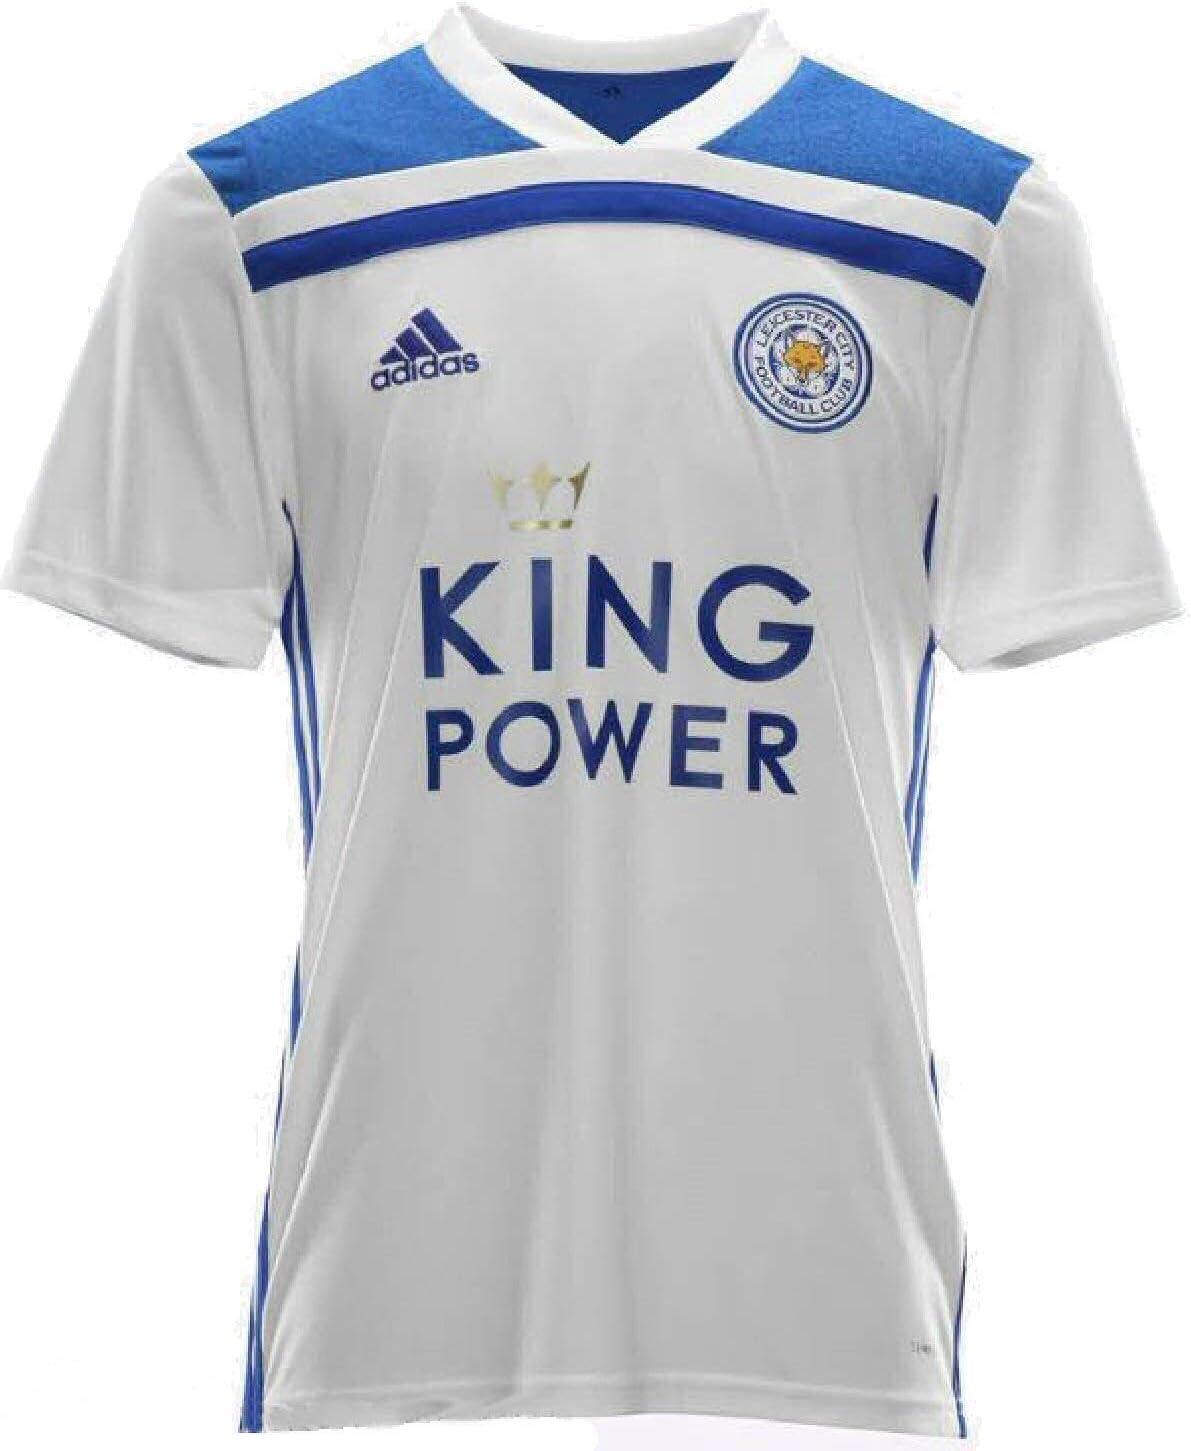 Pescador Depender de Cenagal  Leicester City F.C. LCFC Adidas Men's Away Football Shirt 2018-2019:  Amazon.co.uk: Sports & Outdoors